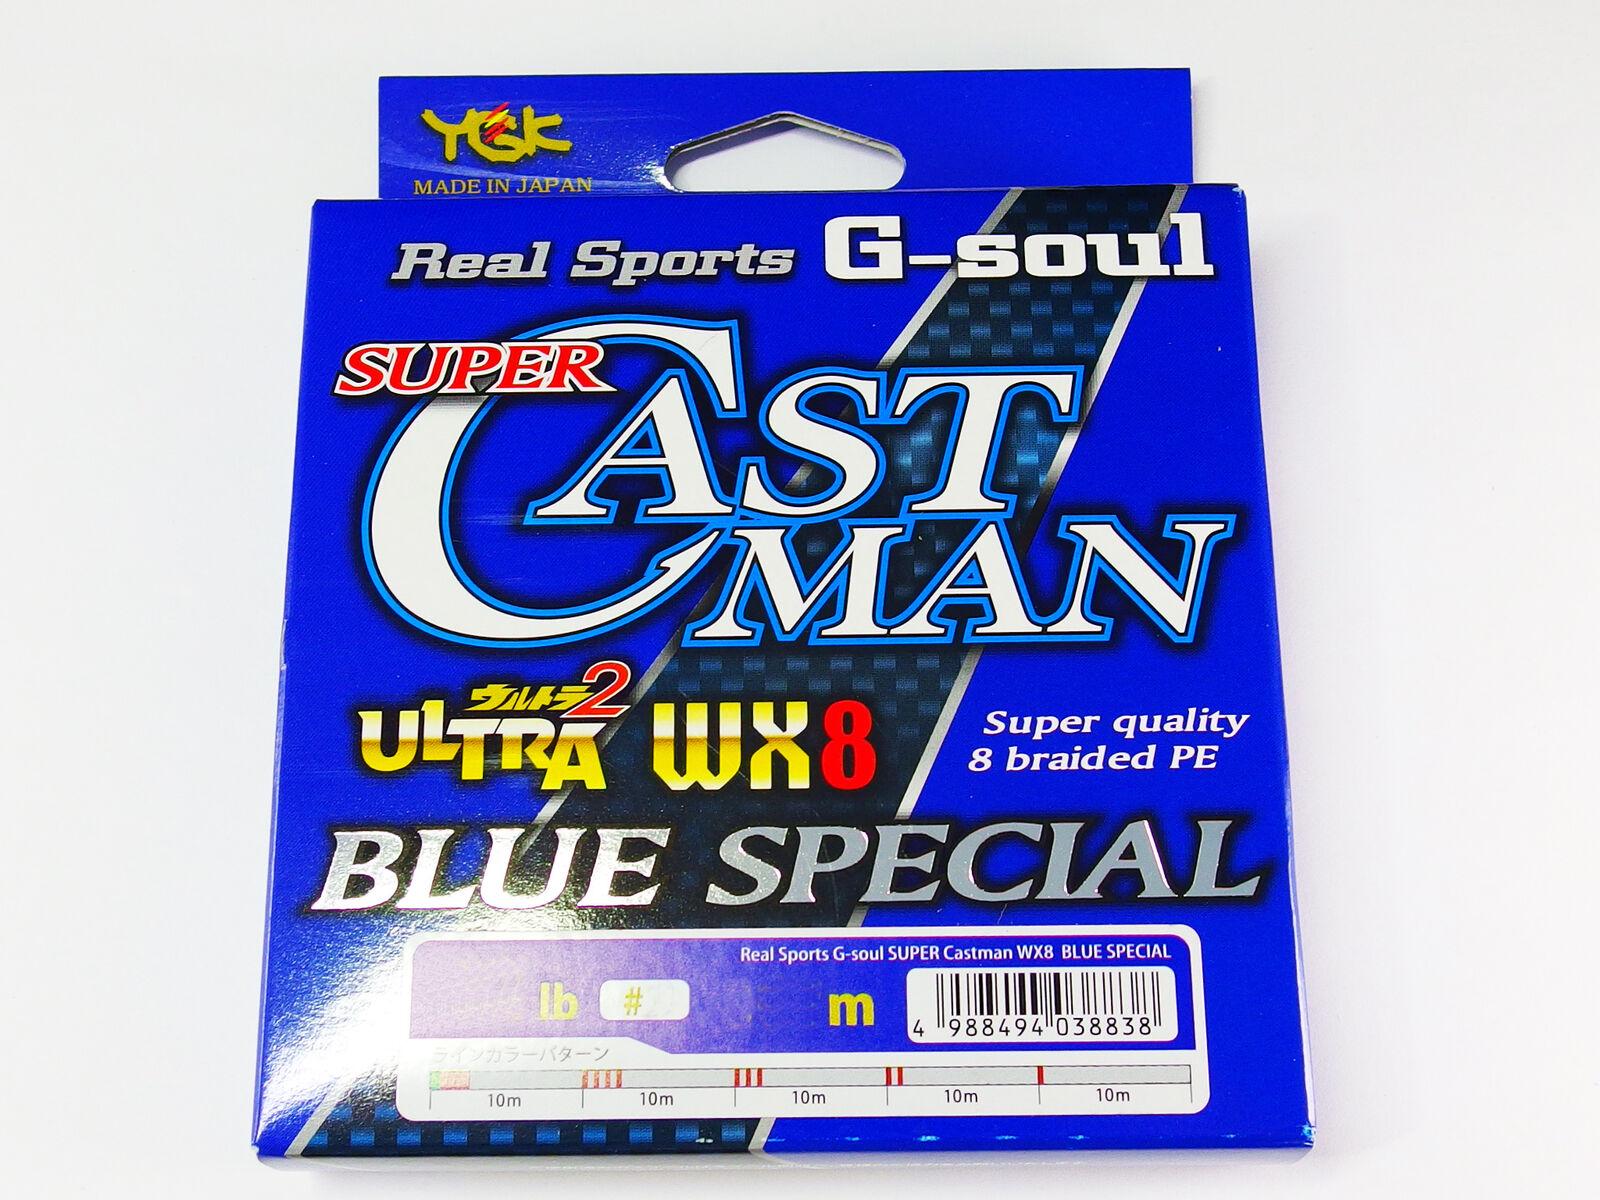 YGK - Real Sports G-SOUL SUPER CASTMAN WX8 blueE SPECIAL 300m lb